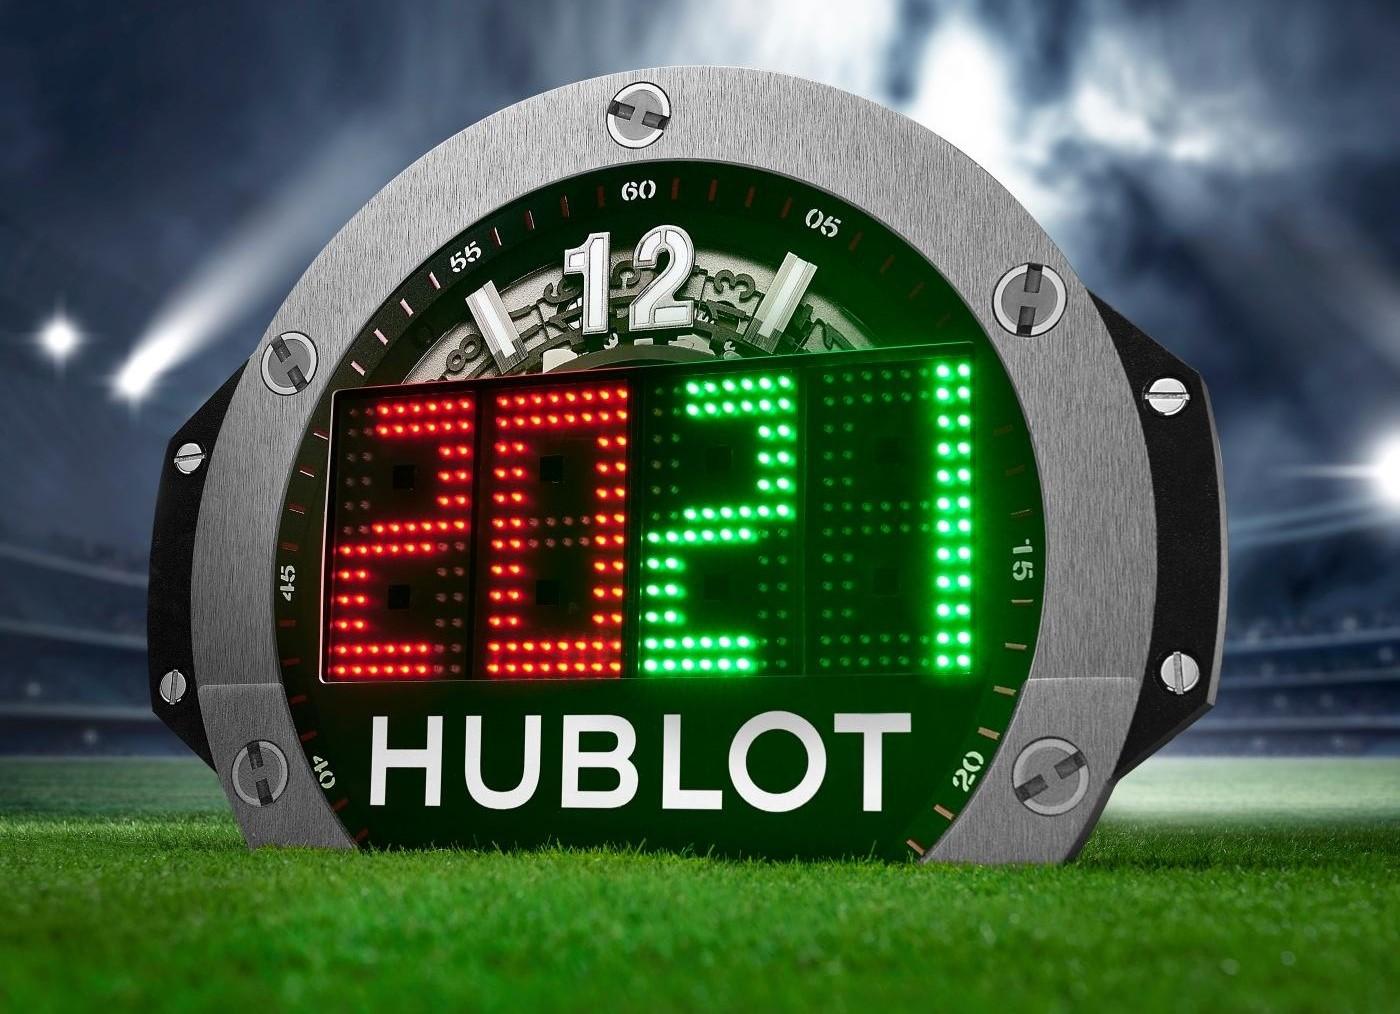 Hublot : partenaire indéfectible du football